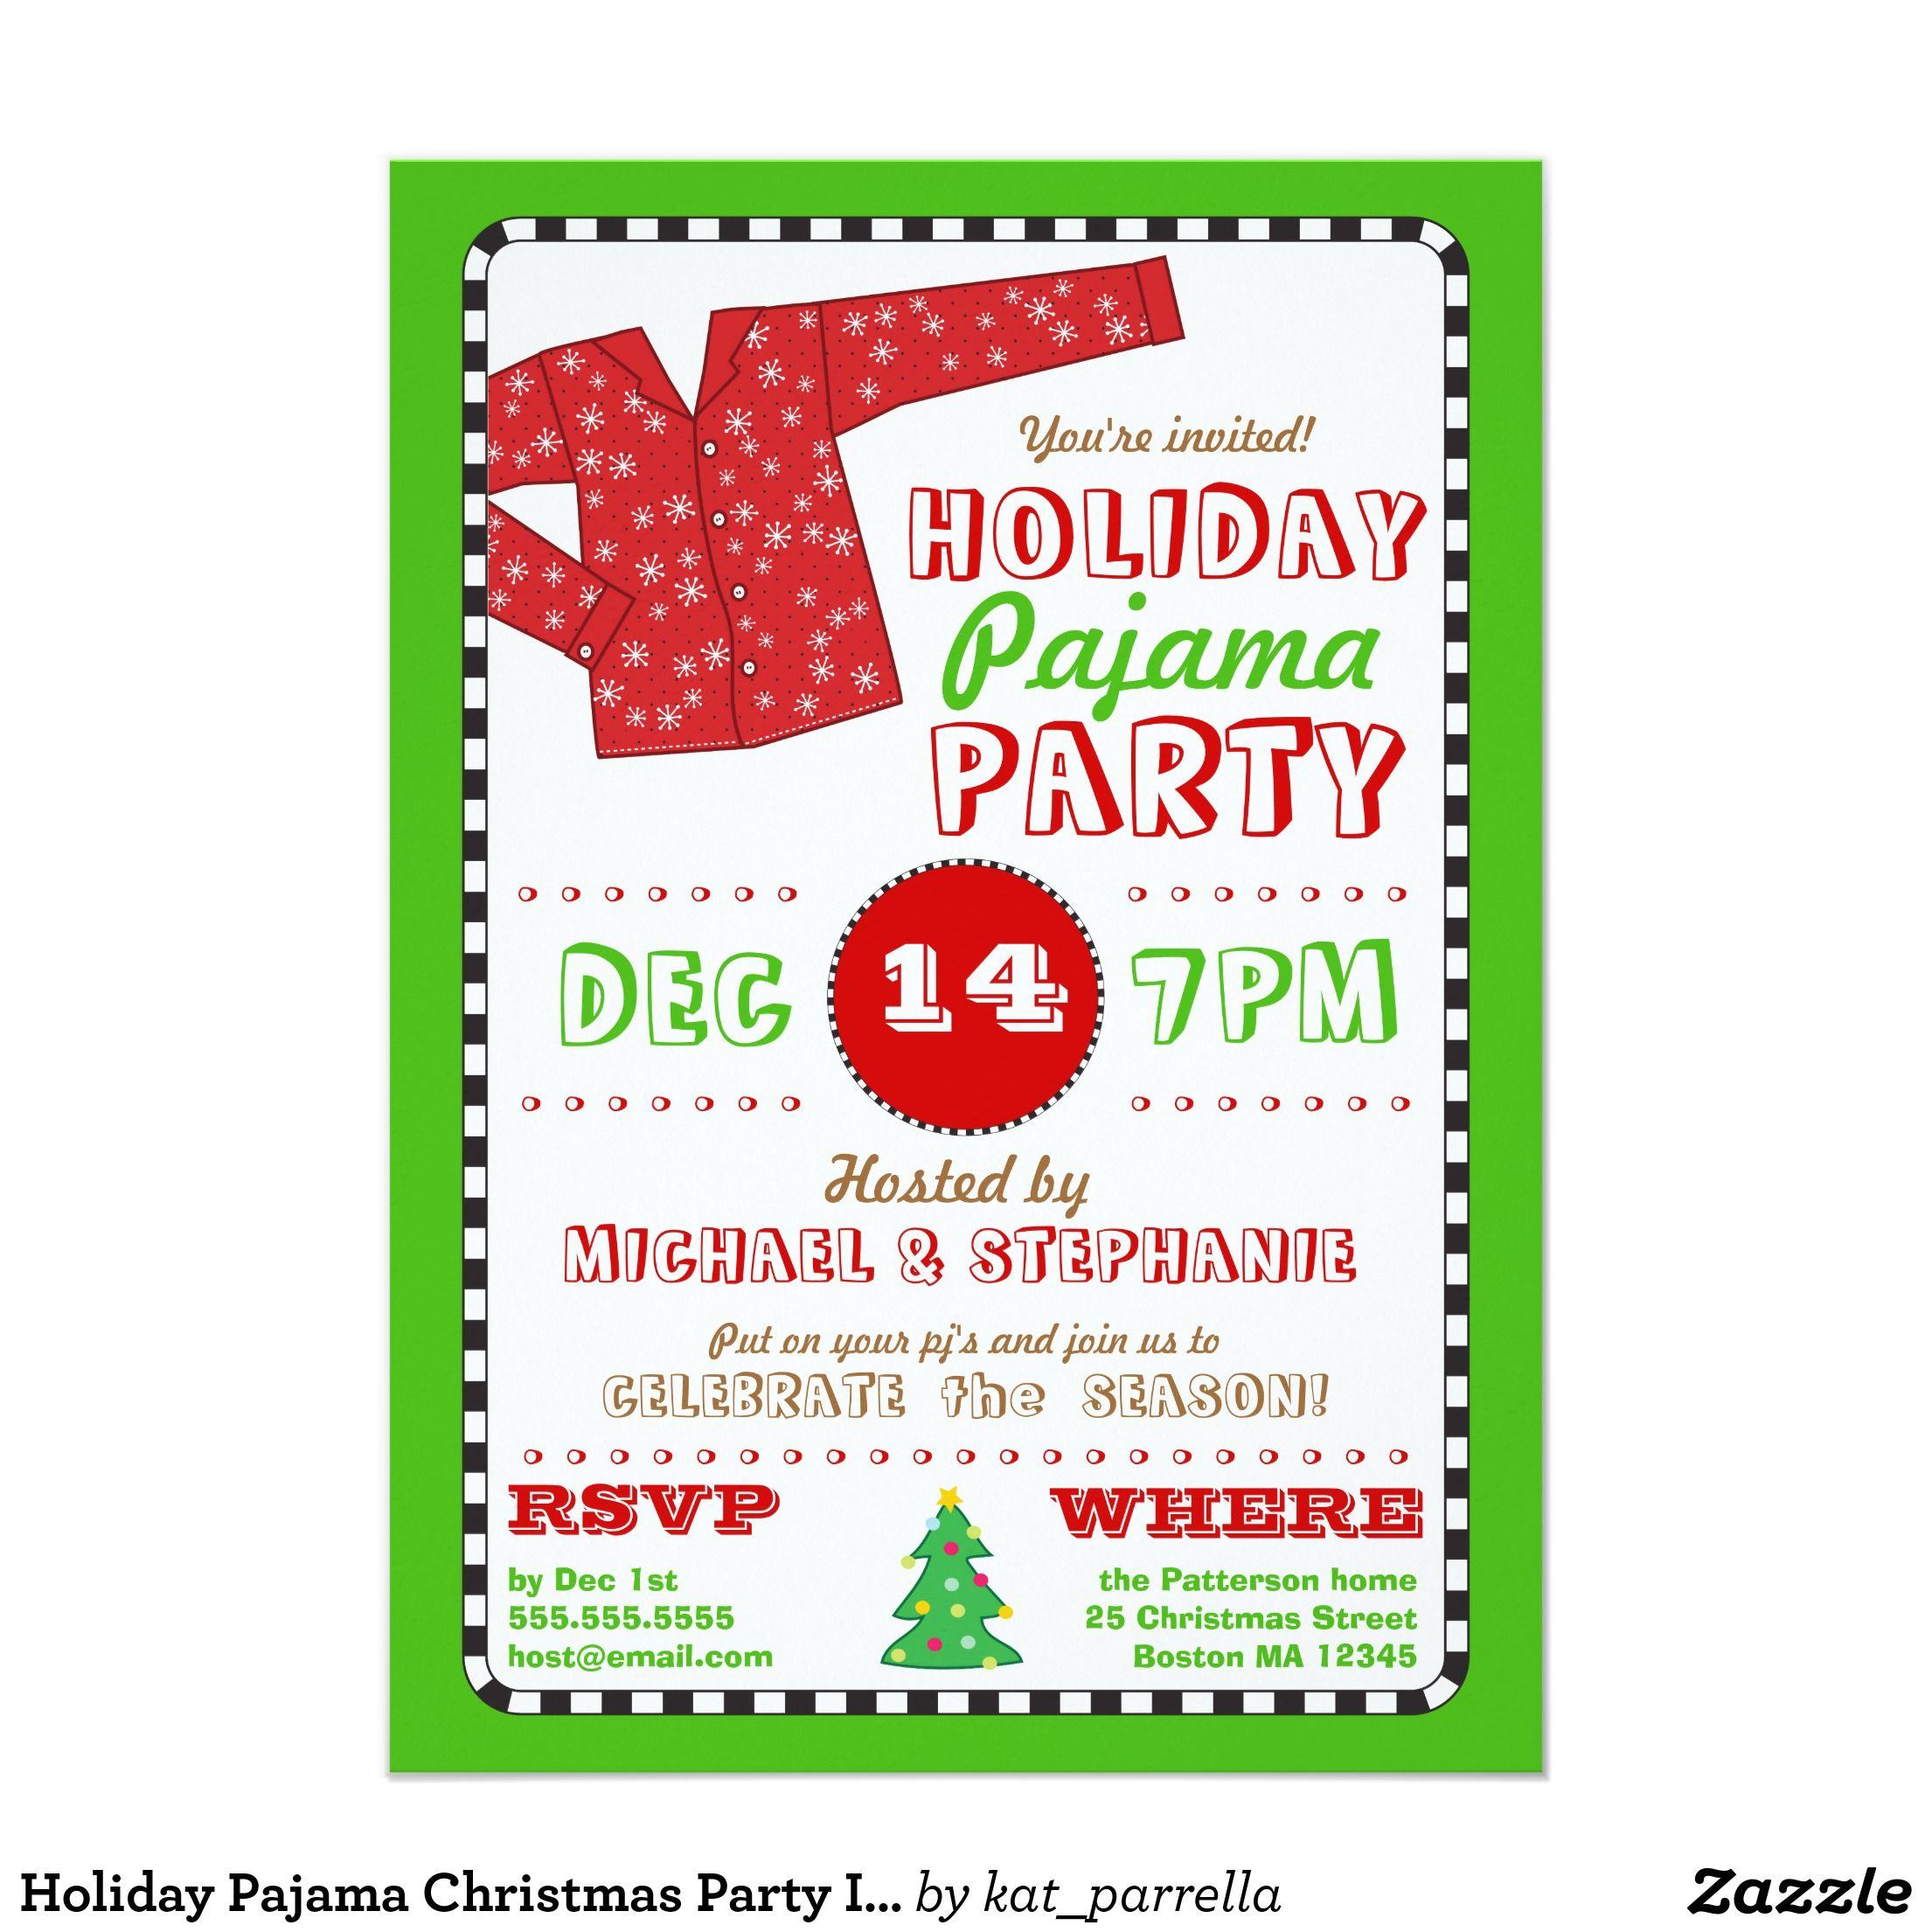 Holiday Pajama Christmas Party Invitation | Holiday pajamas, Party ...